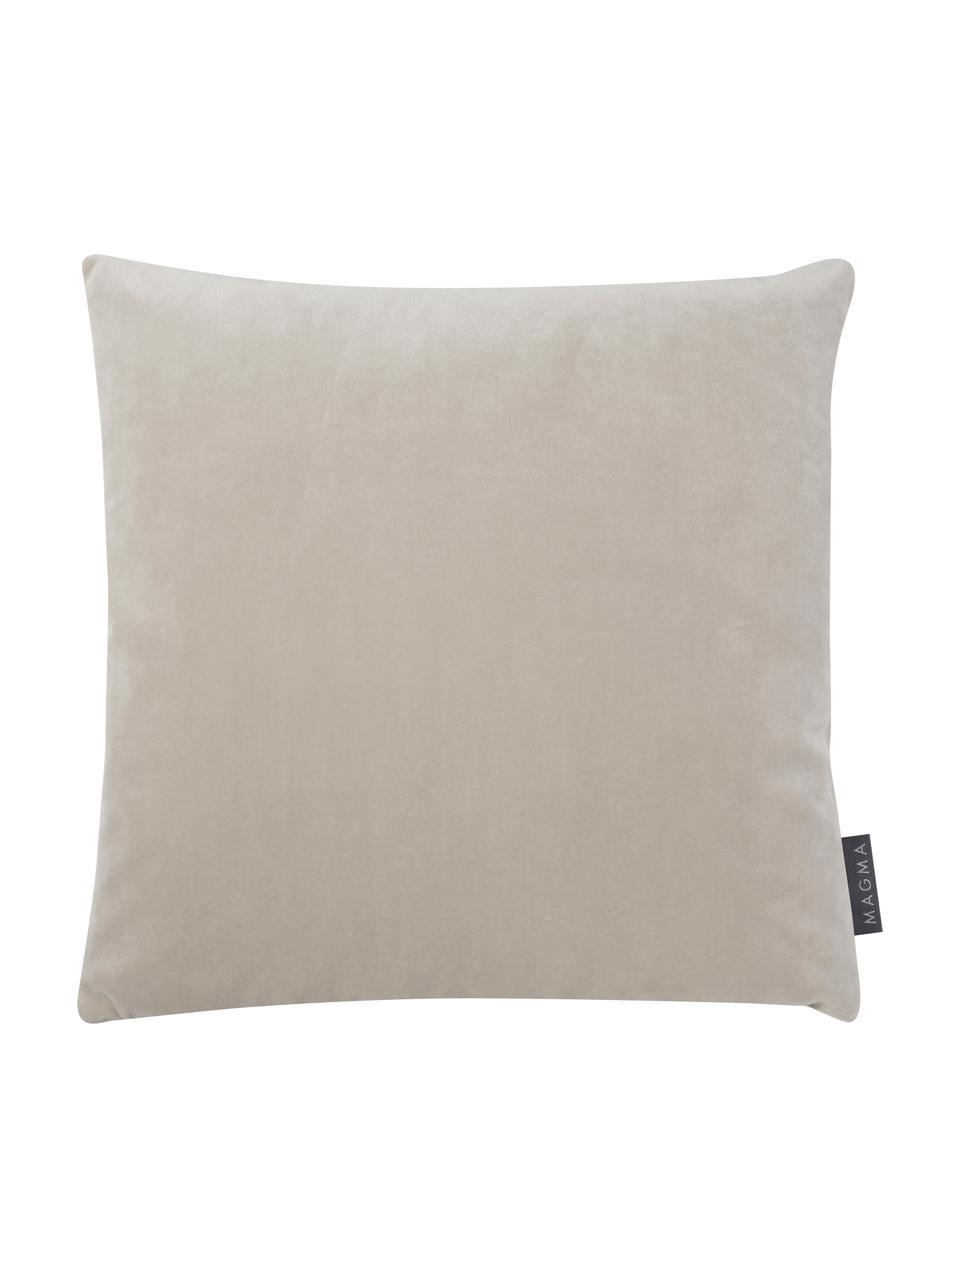 Funda de cojín Dulce, 78%poliéster, 22%algodón, Beige, An 40 x L 40 cm